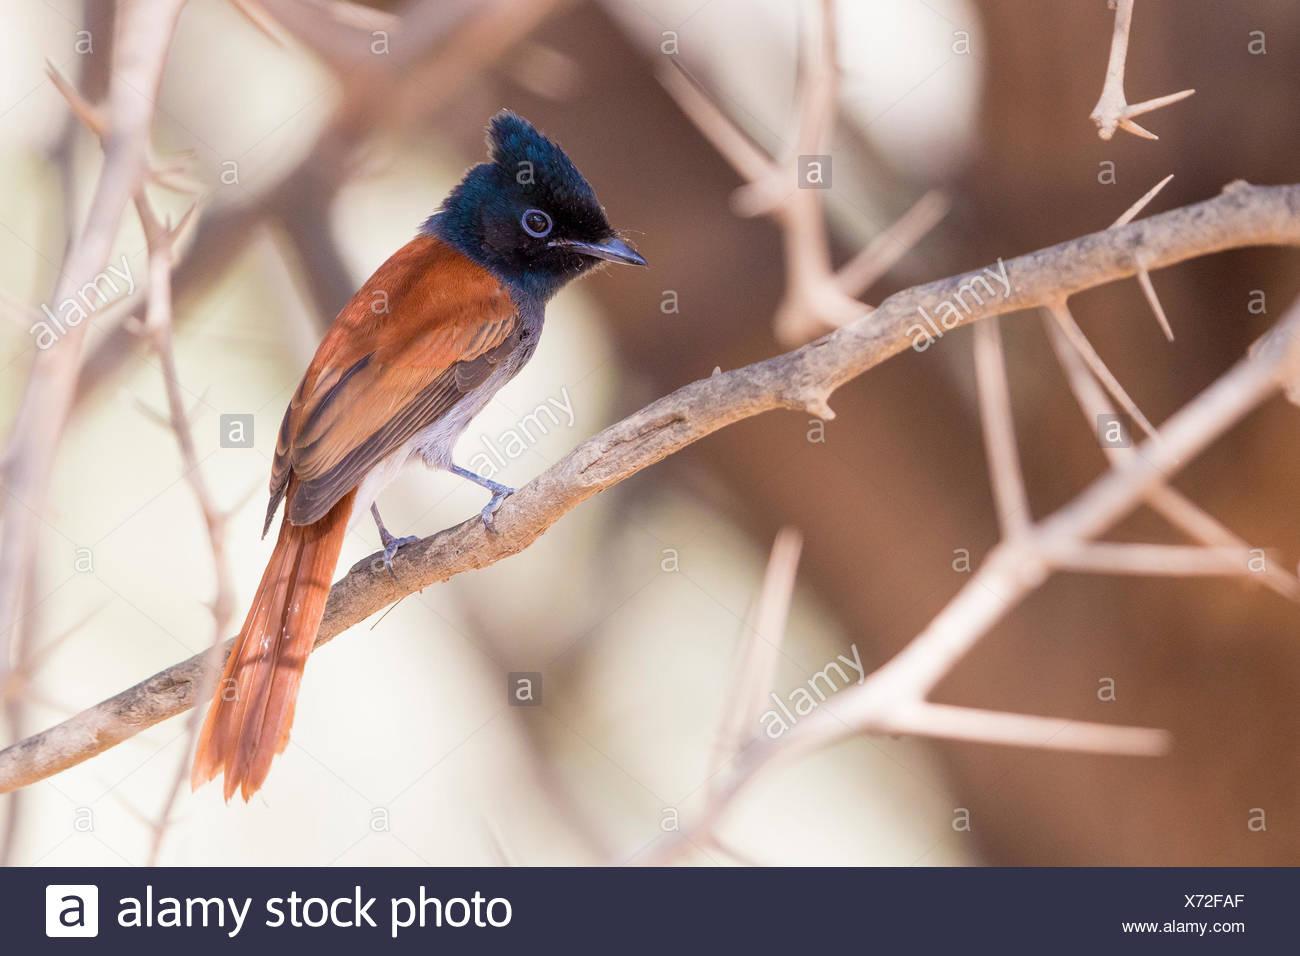 African Paradise Flycatcher (Terpsiphone viridis ssp harteti), adult perched on a branch, Ayn Hamran, Dhofar, Oman Stock Photo